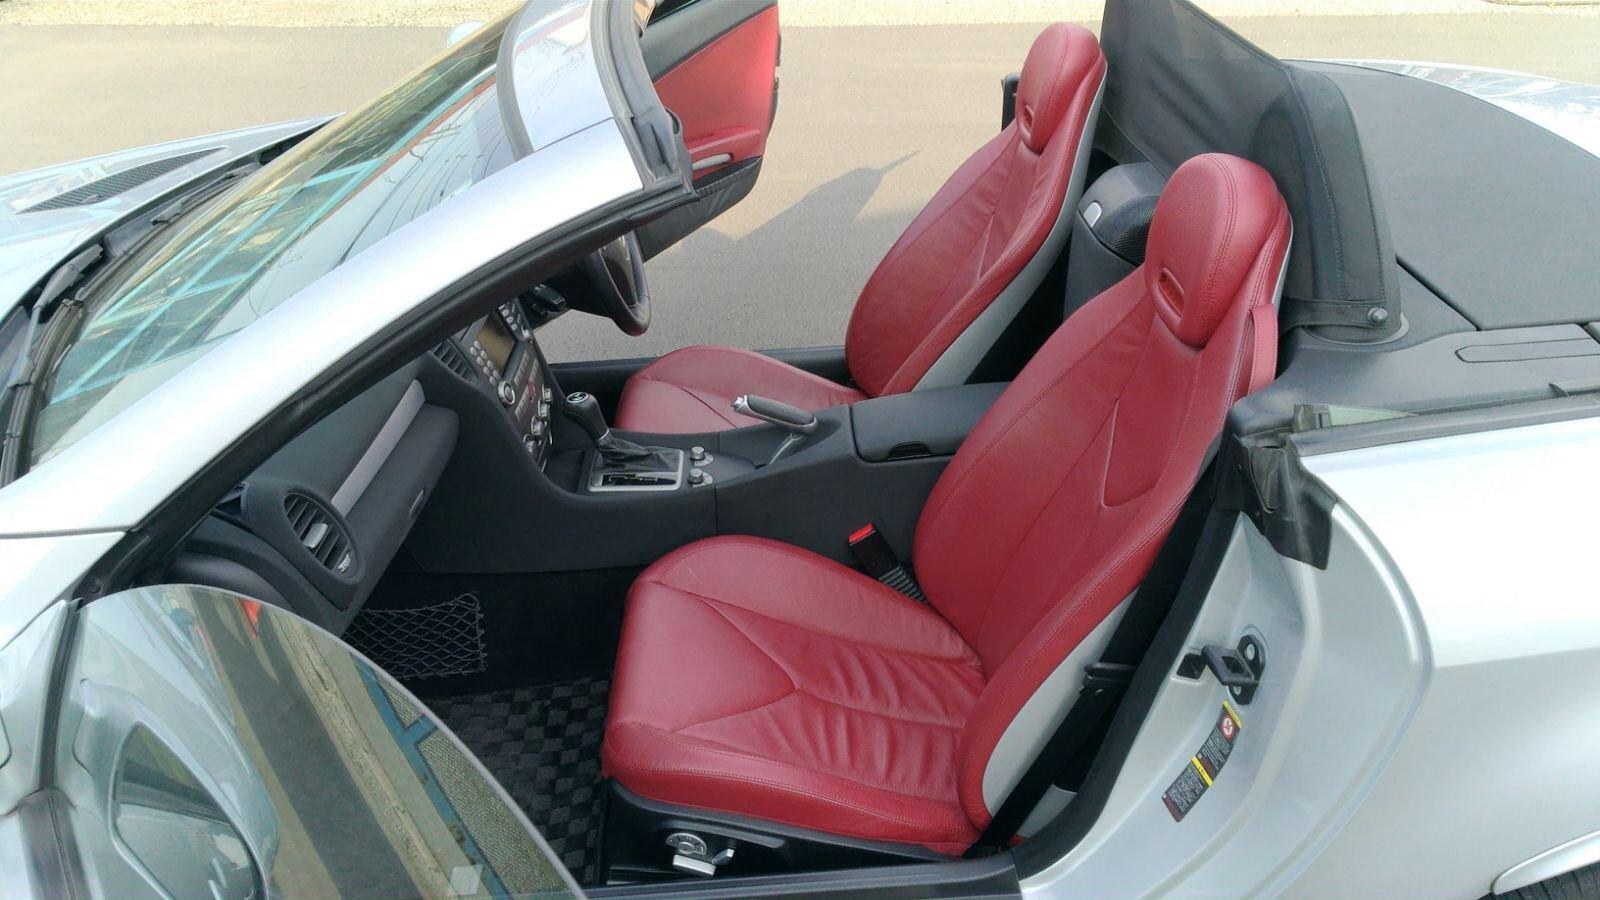 2006 Mercedes SLK 350 -AMG package- For Sale (picture 3 of 6)